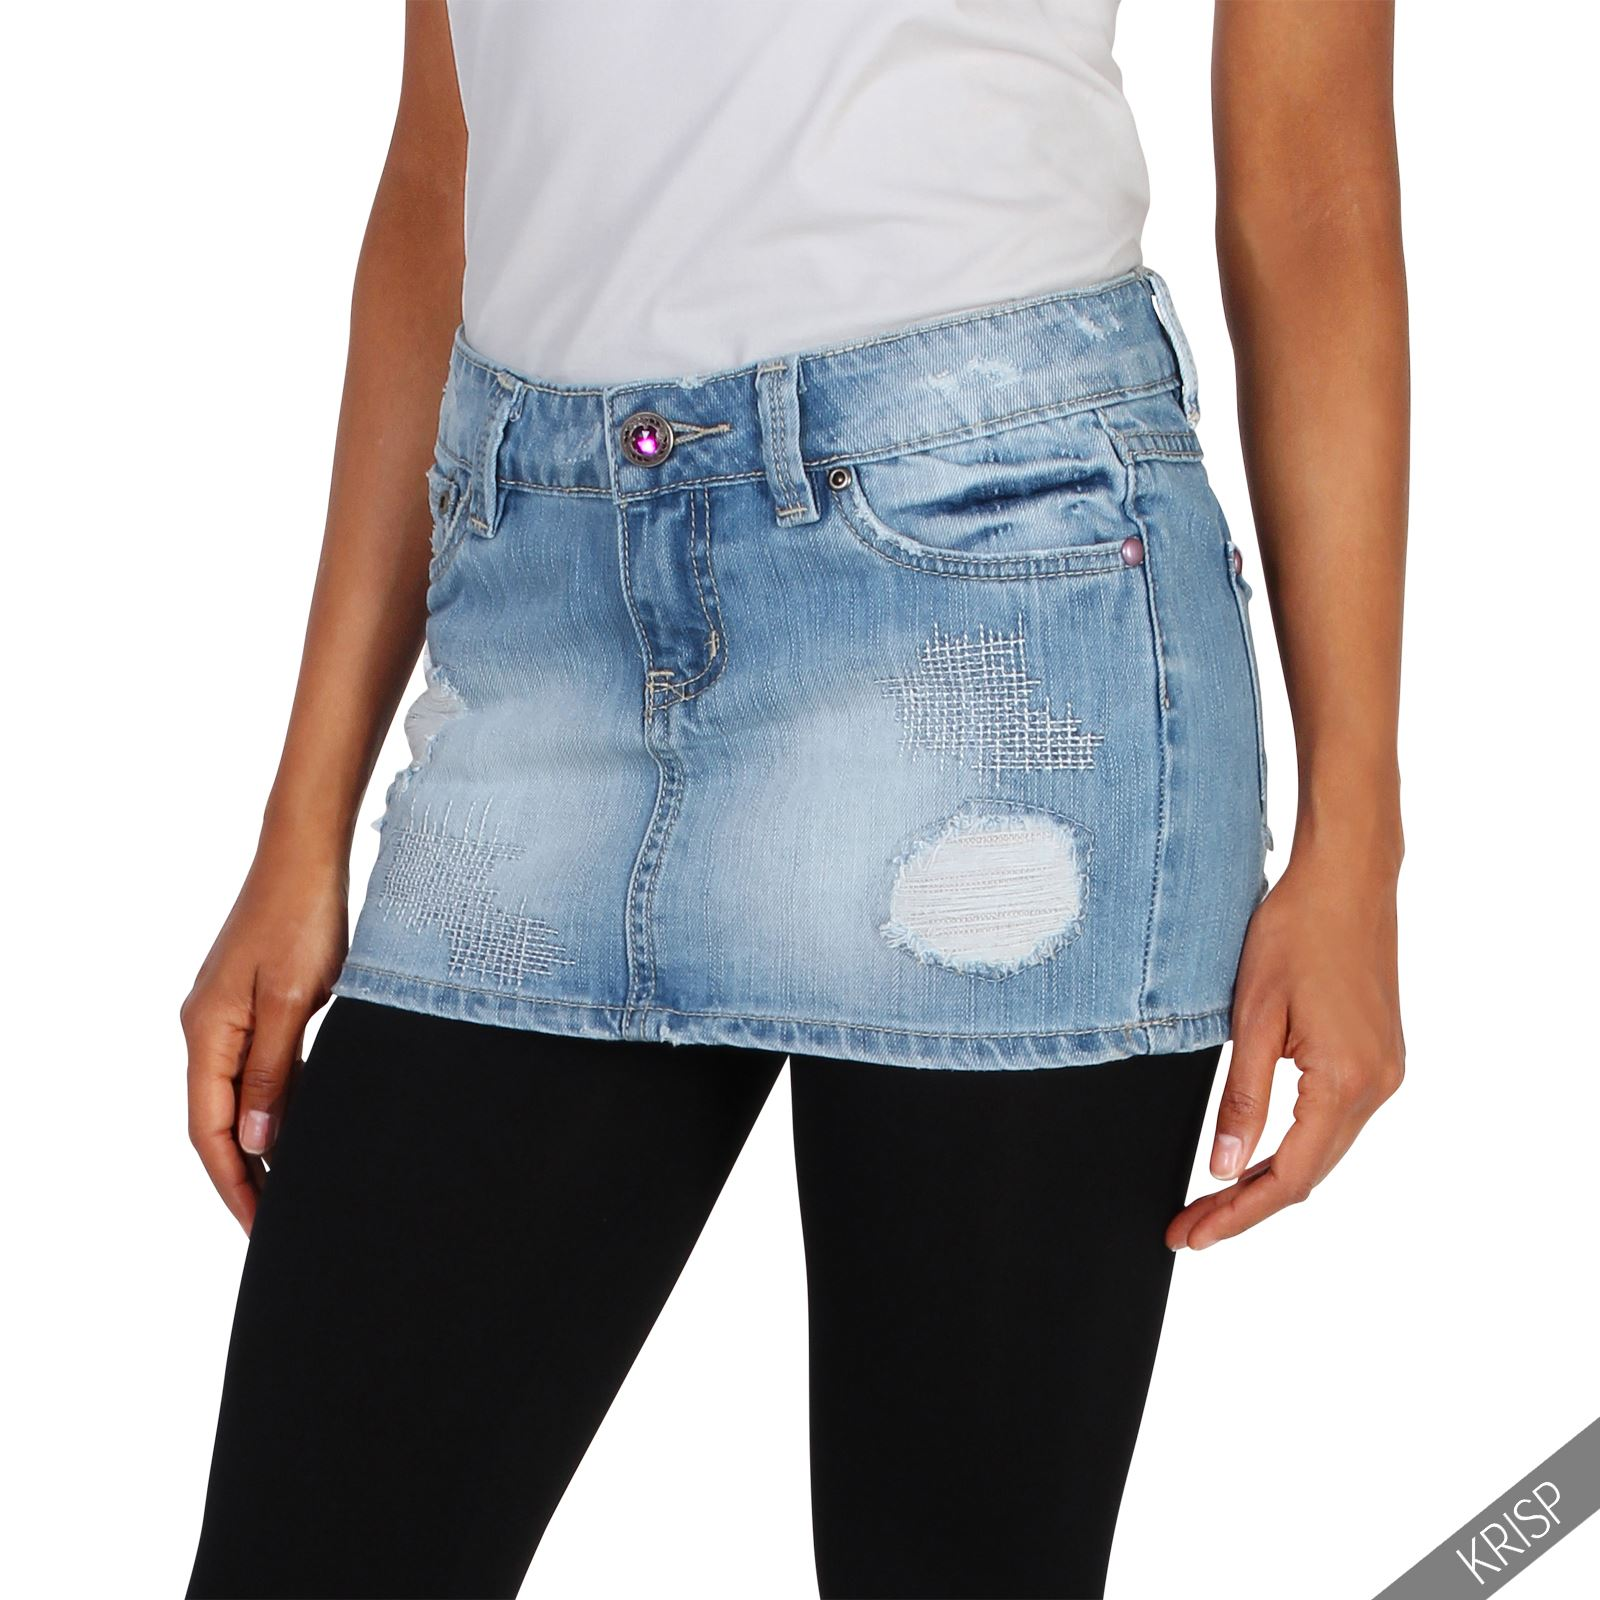 damen supermini jeans rock used look denim aufgerissen. Black Bedroom Furniture Sets. Home Design Ideas